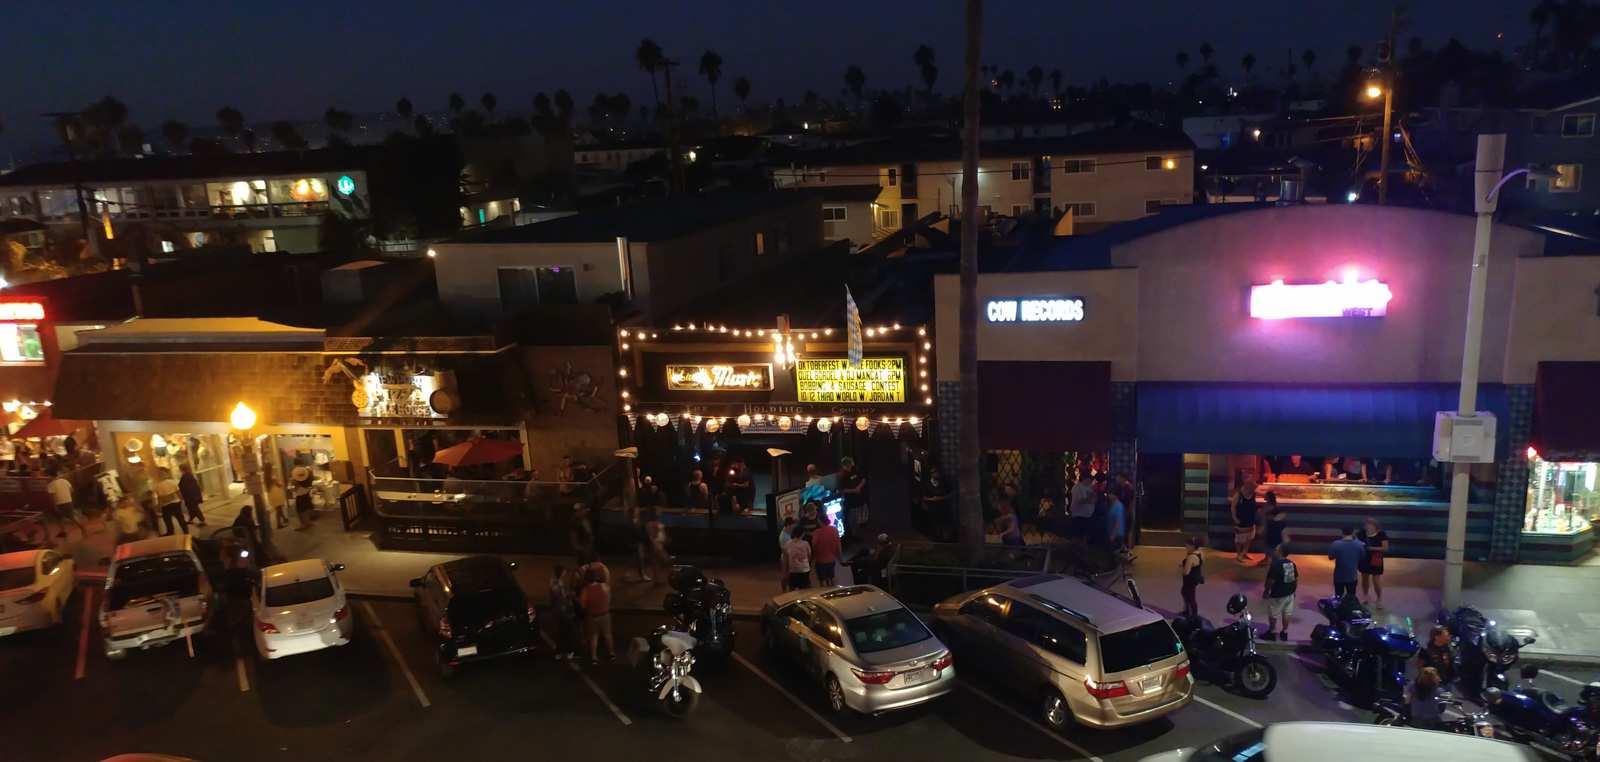 Pizza THC Cheswick's San Diego Ocean Beach